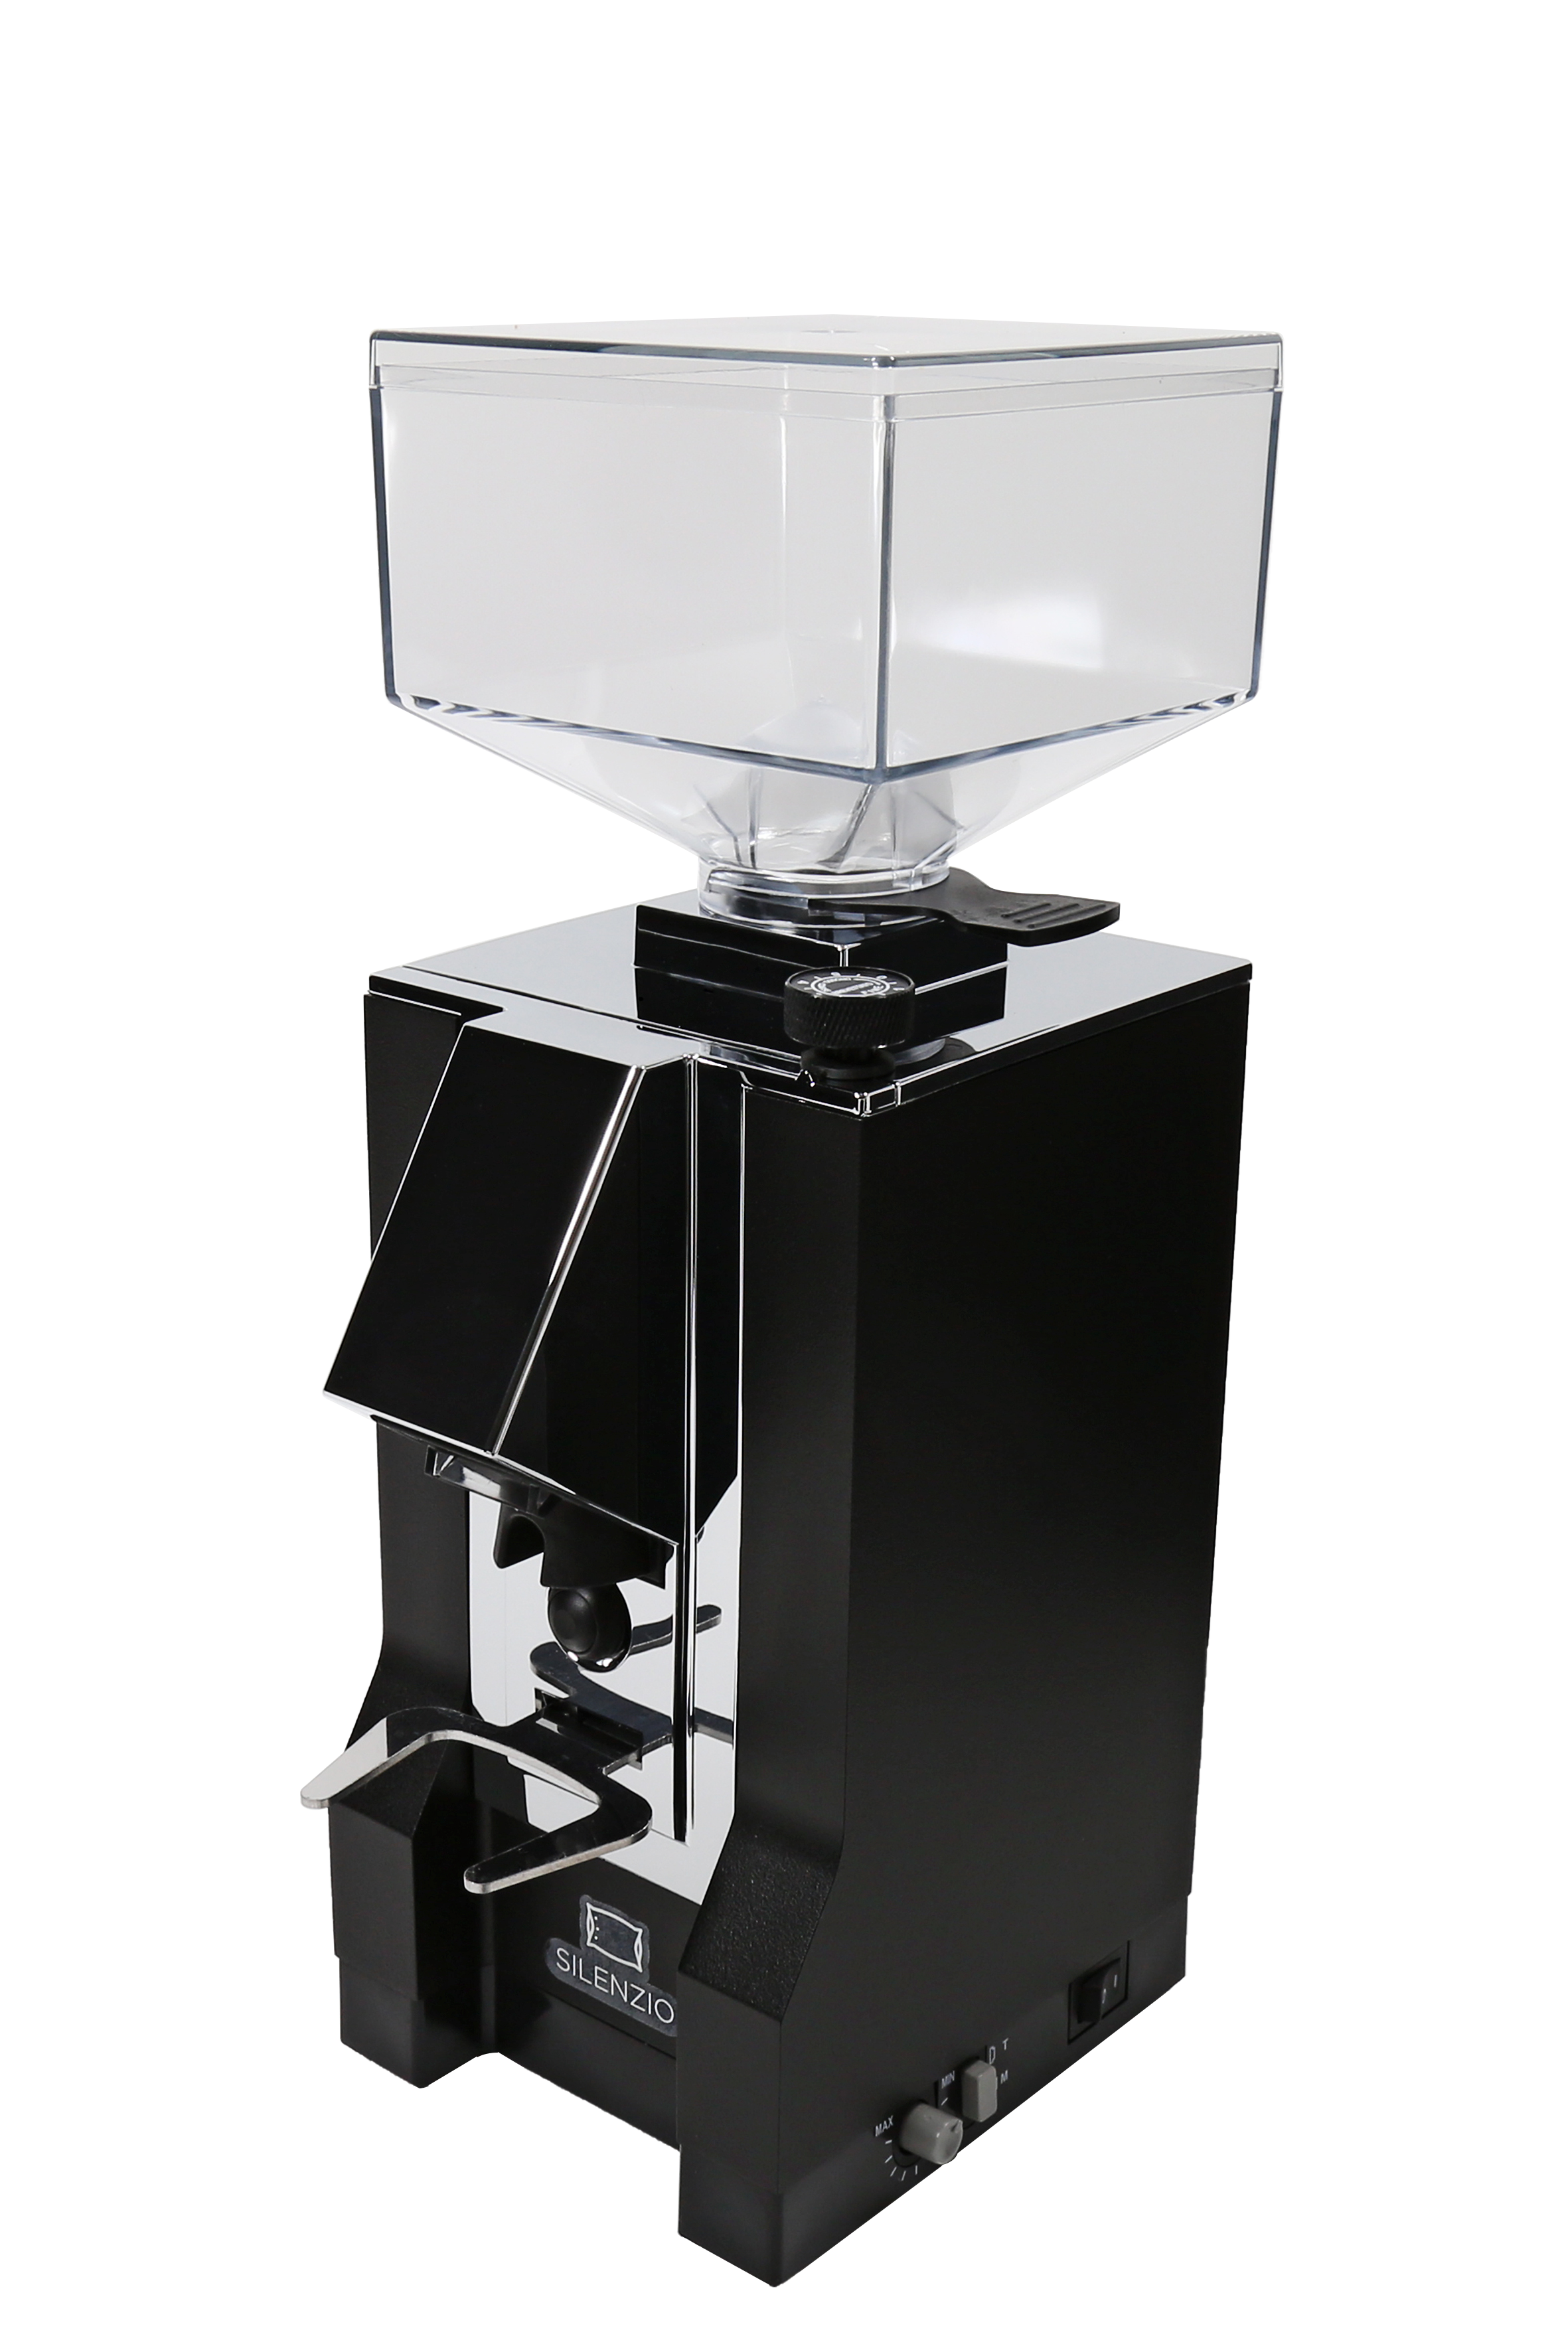 Eureka Mignon Silenzio Kaffeemühle (Mattschwarz/Chrom)